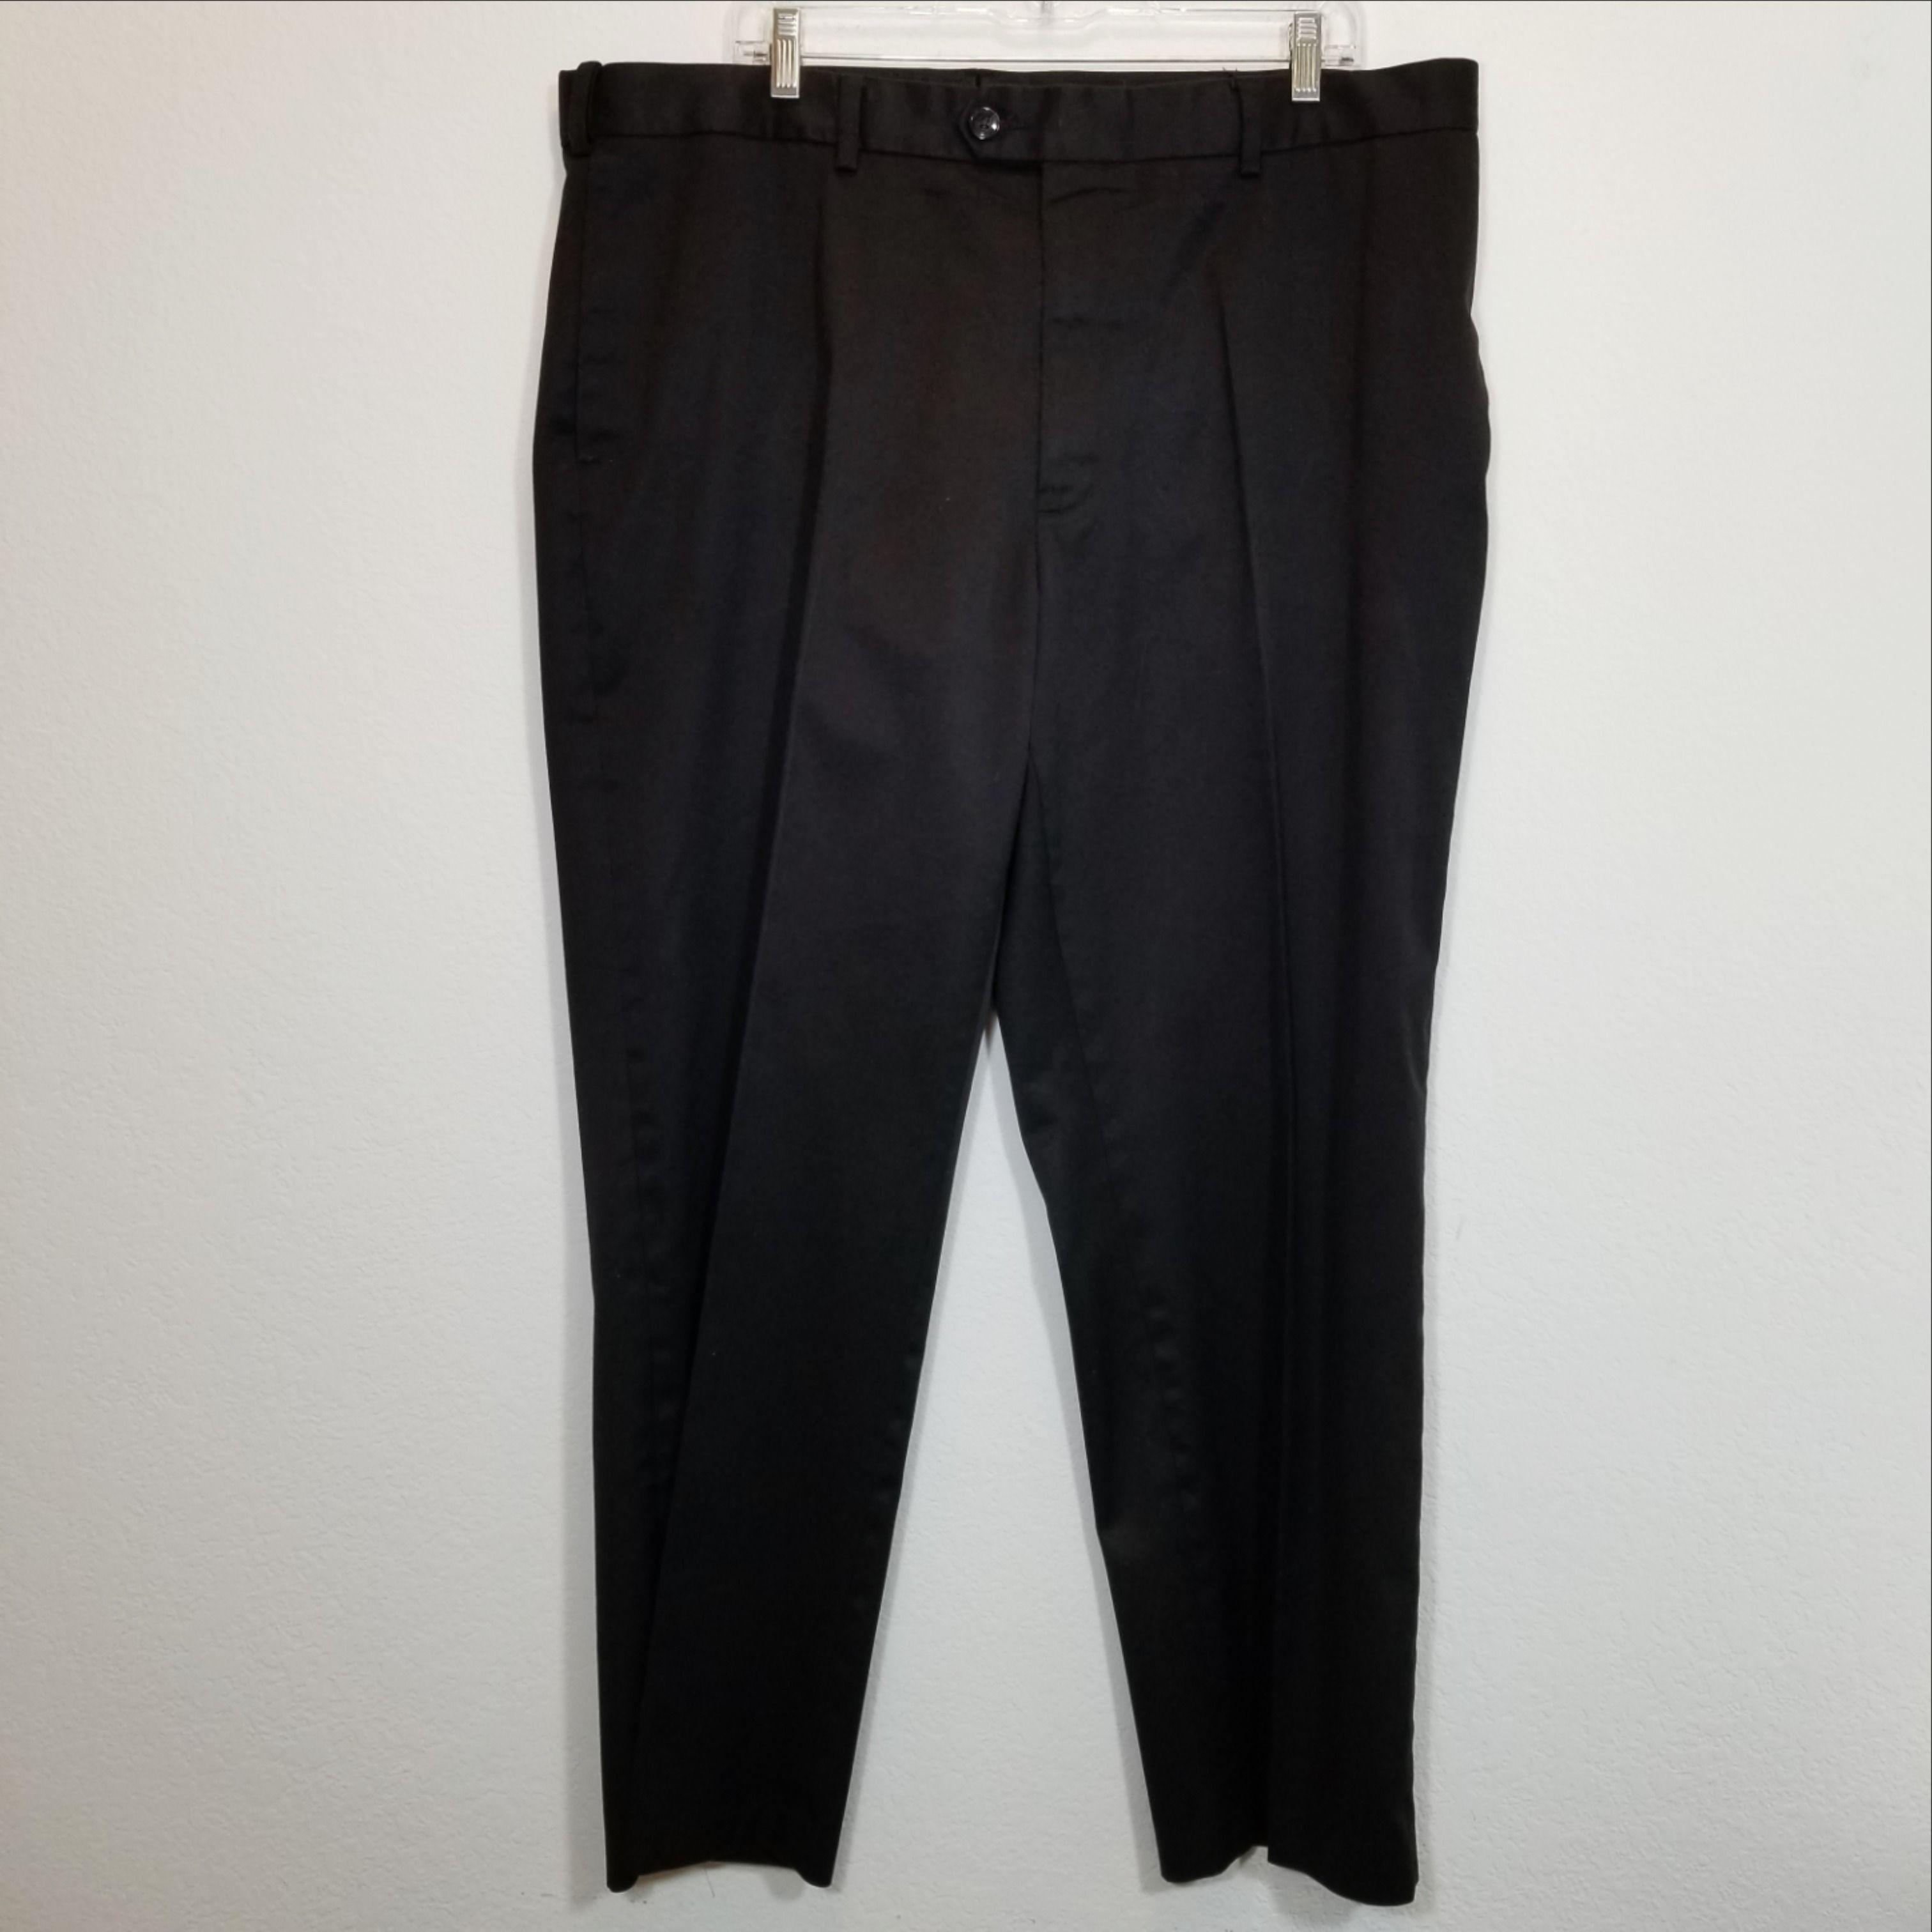 Perry Ellis Mens Black Dress Pants Tag 40x30 Actual Size 40x29 Black Dress Pants Men Black Dress Pants Dress Pants [ 3024 x 3024 Pixel ]